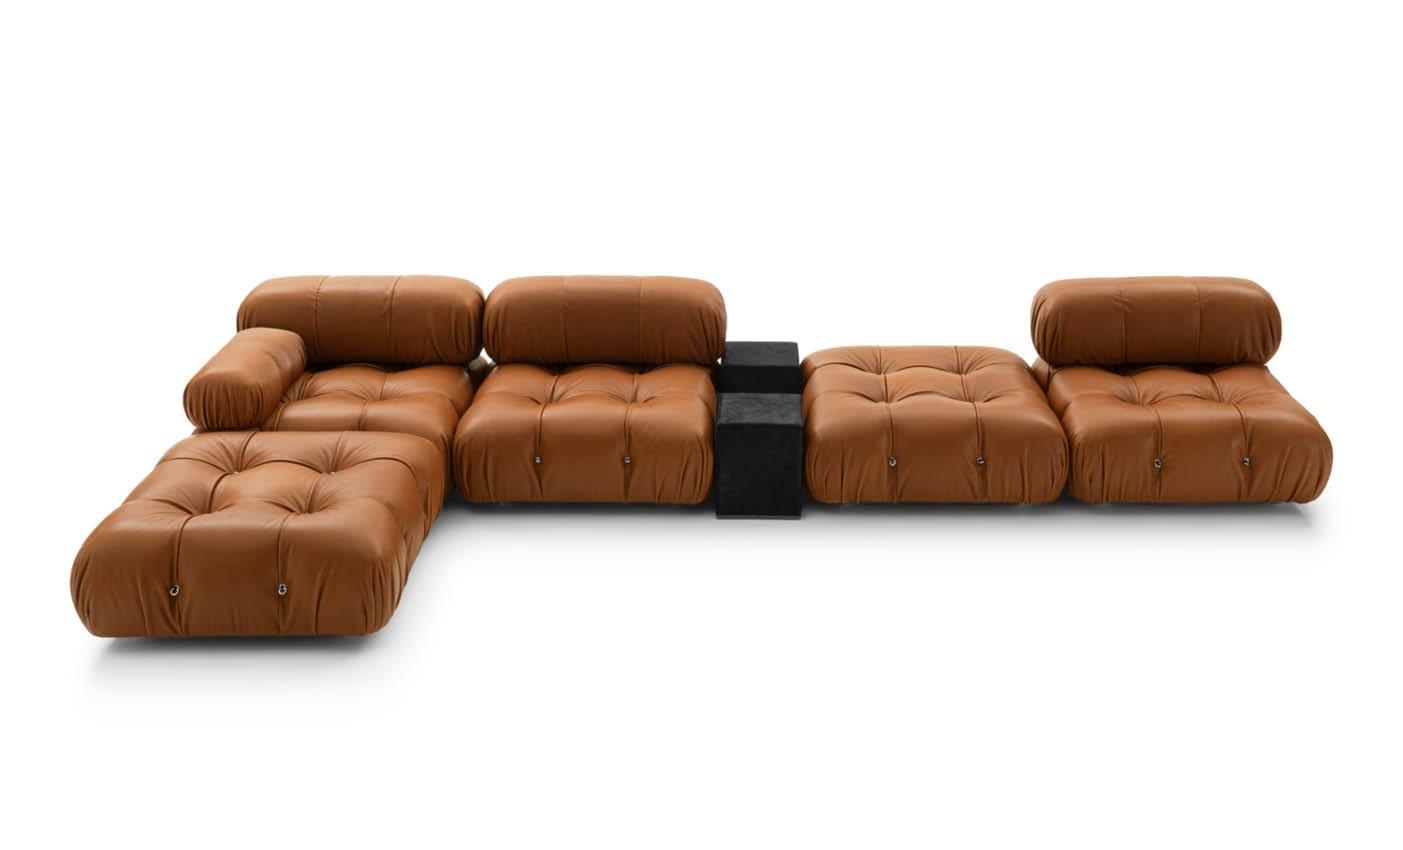 new Camaleonda sofa presente by B&B Italia during Milan design city 2020